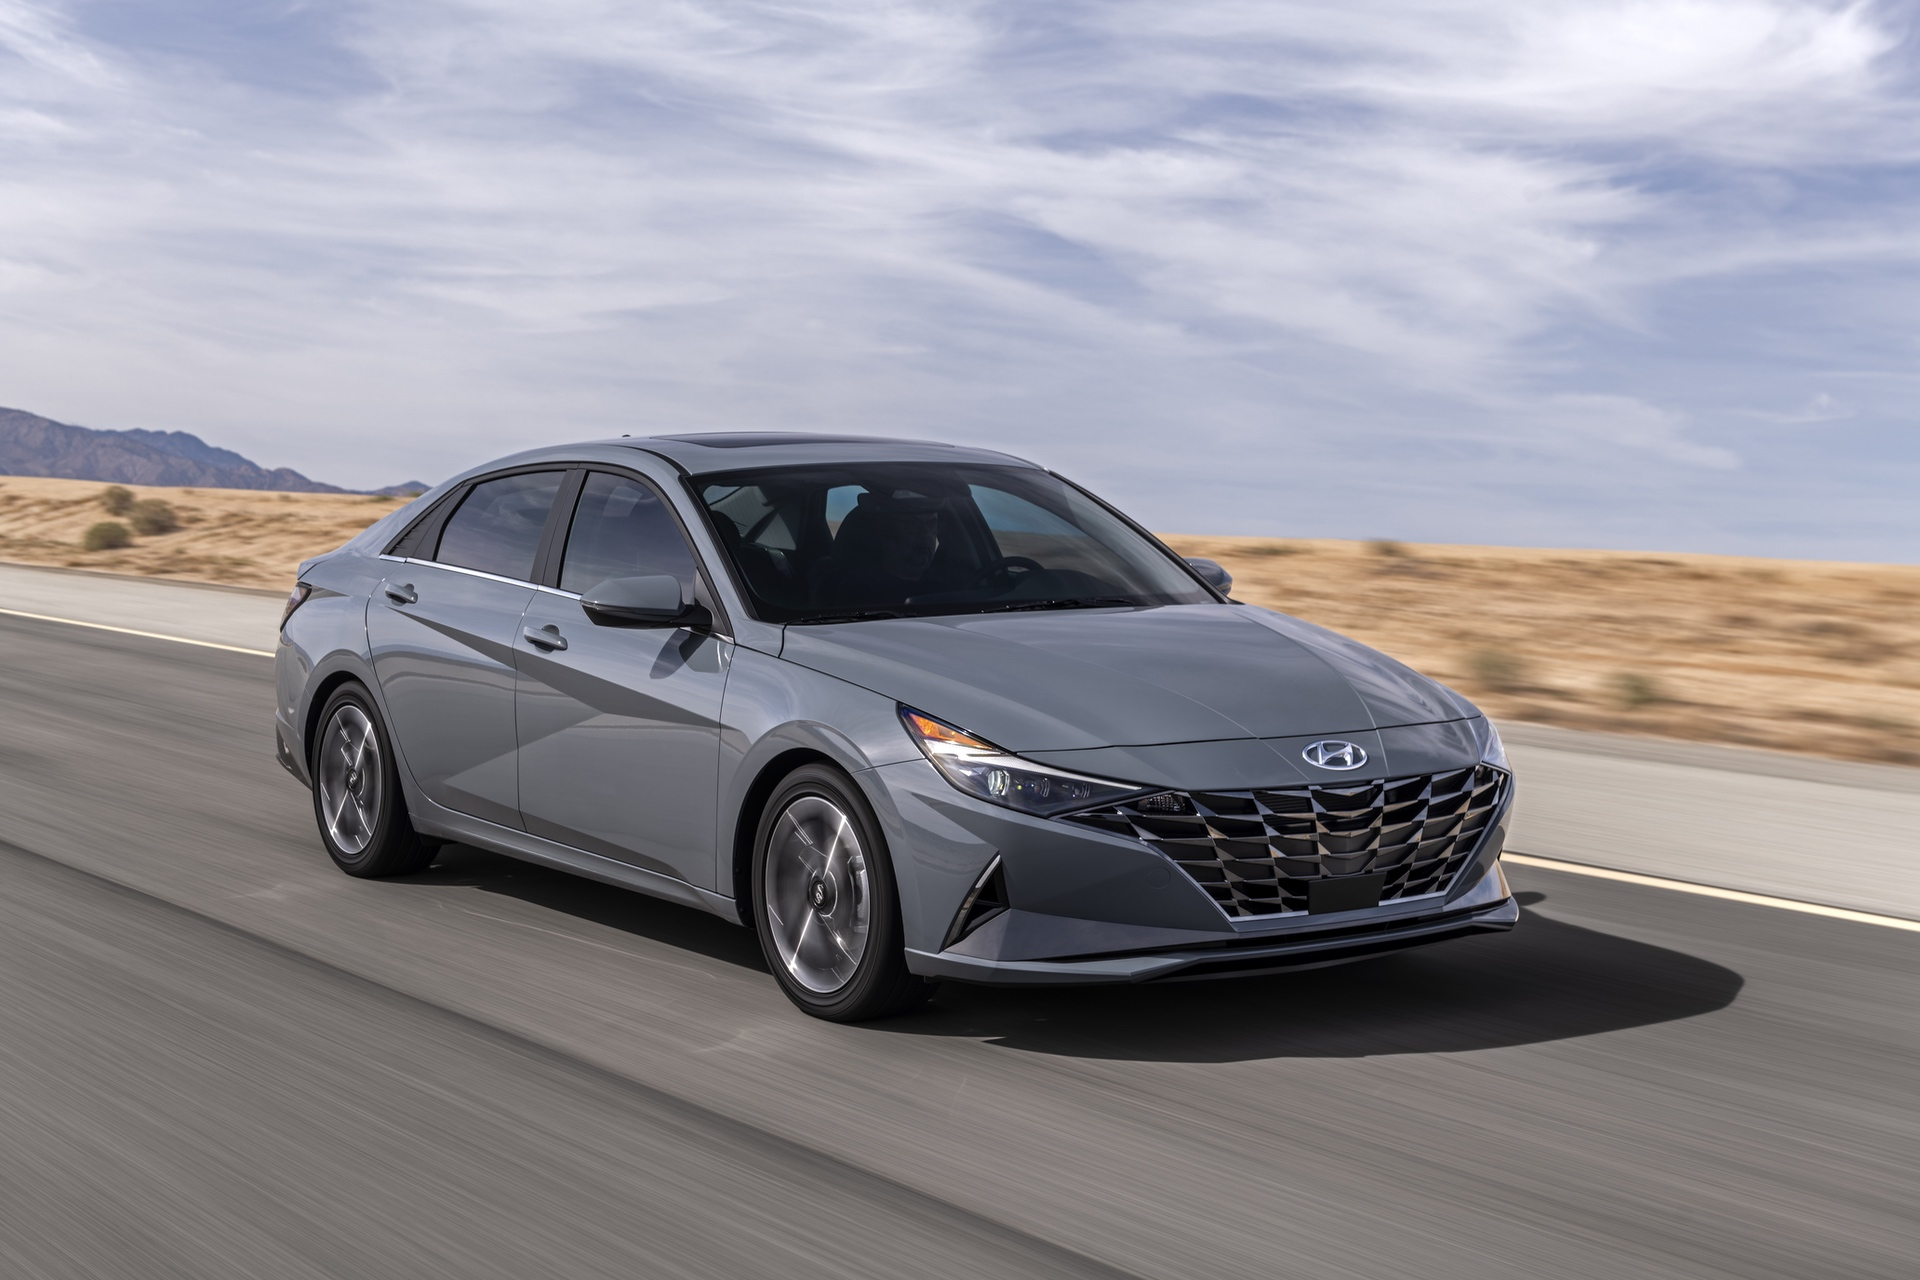 2021_Hyundai_Elantra_Hybrid_0000